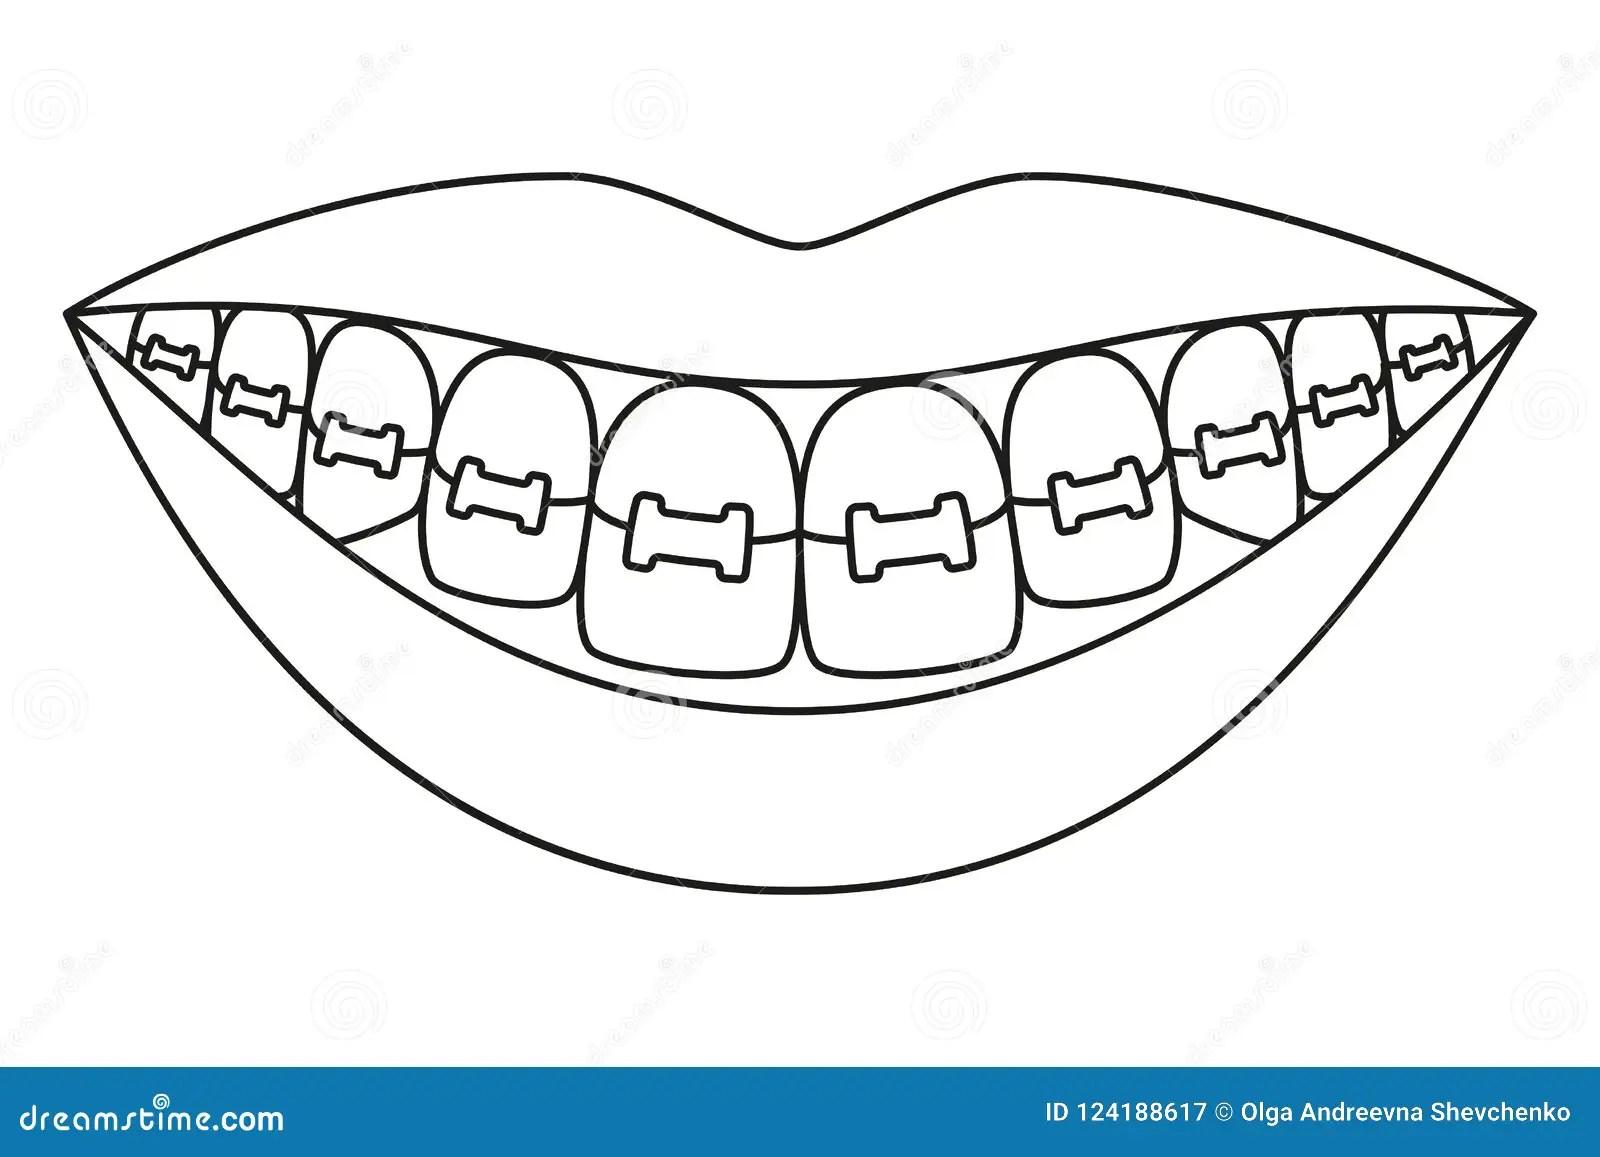 Dentition Cartoon Vector